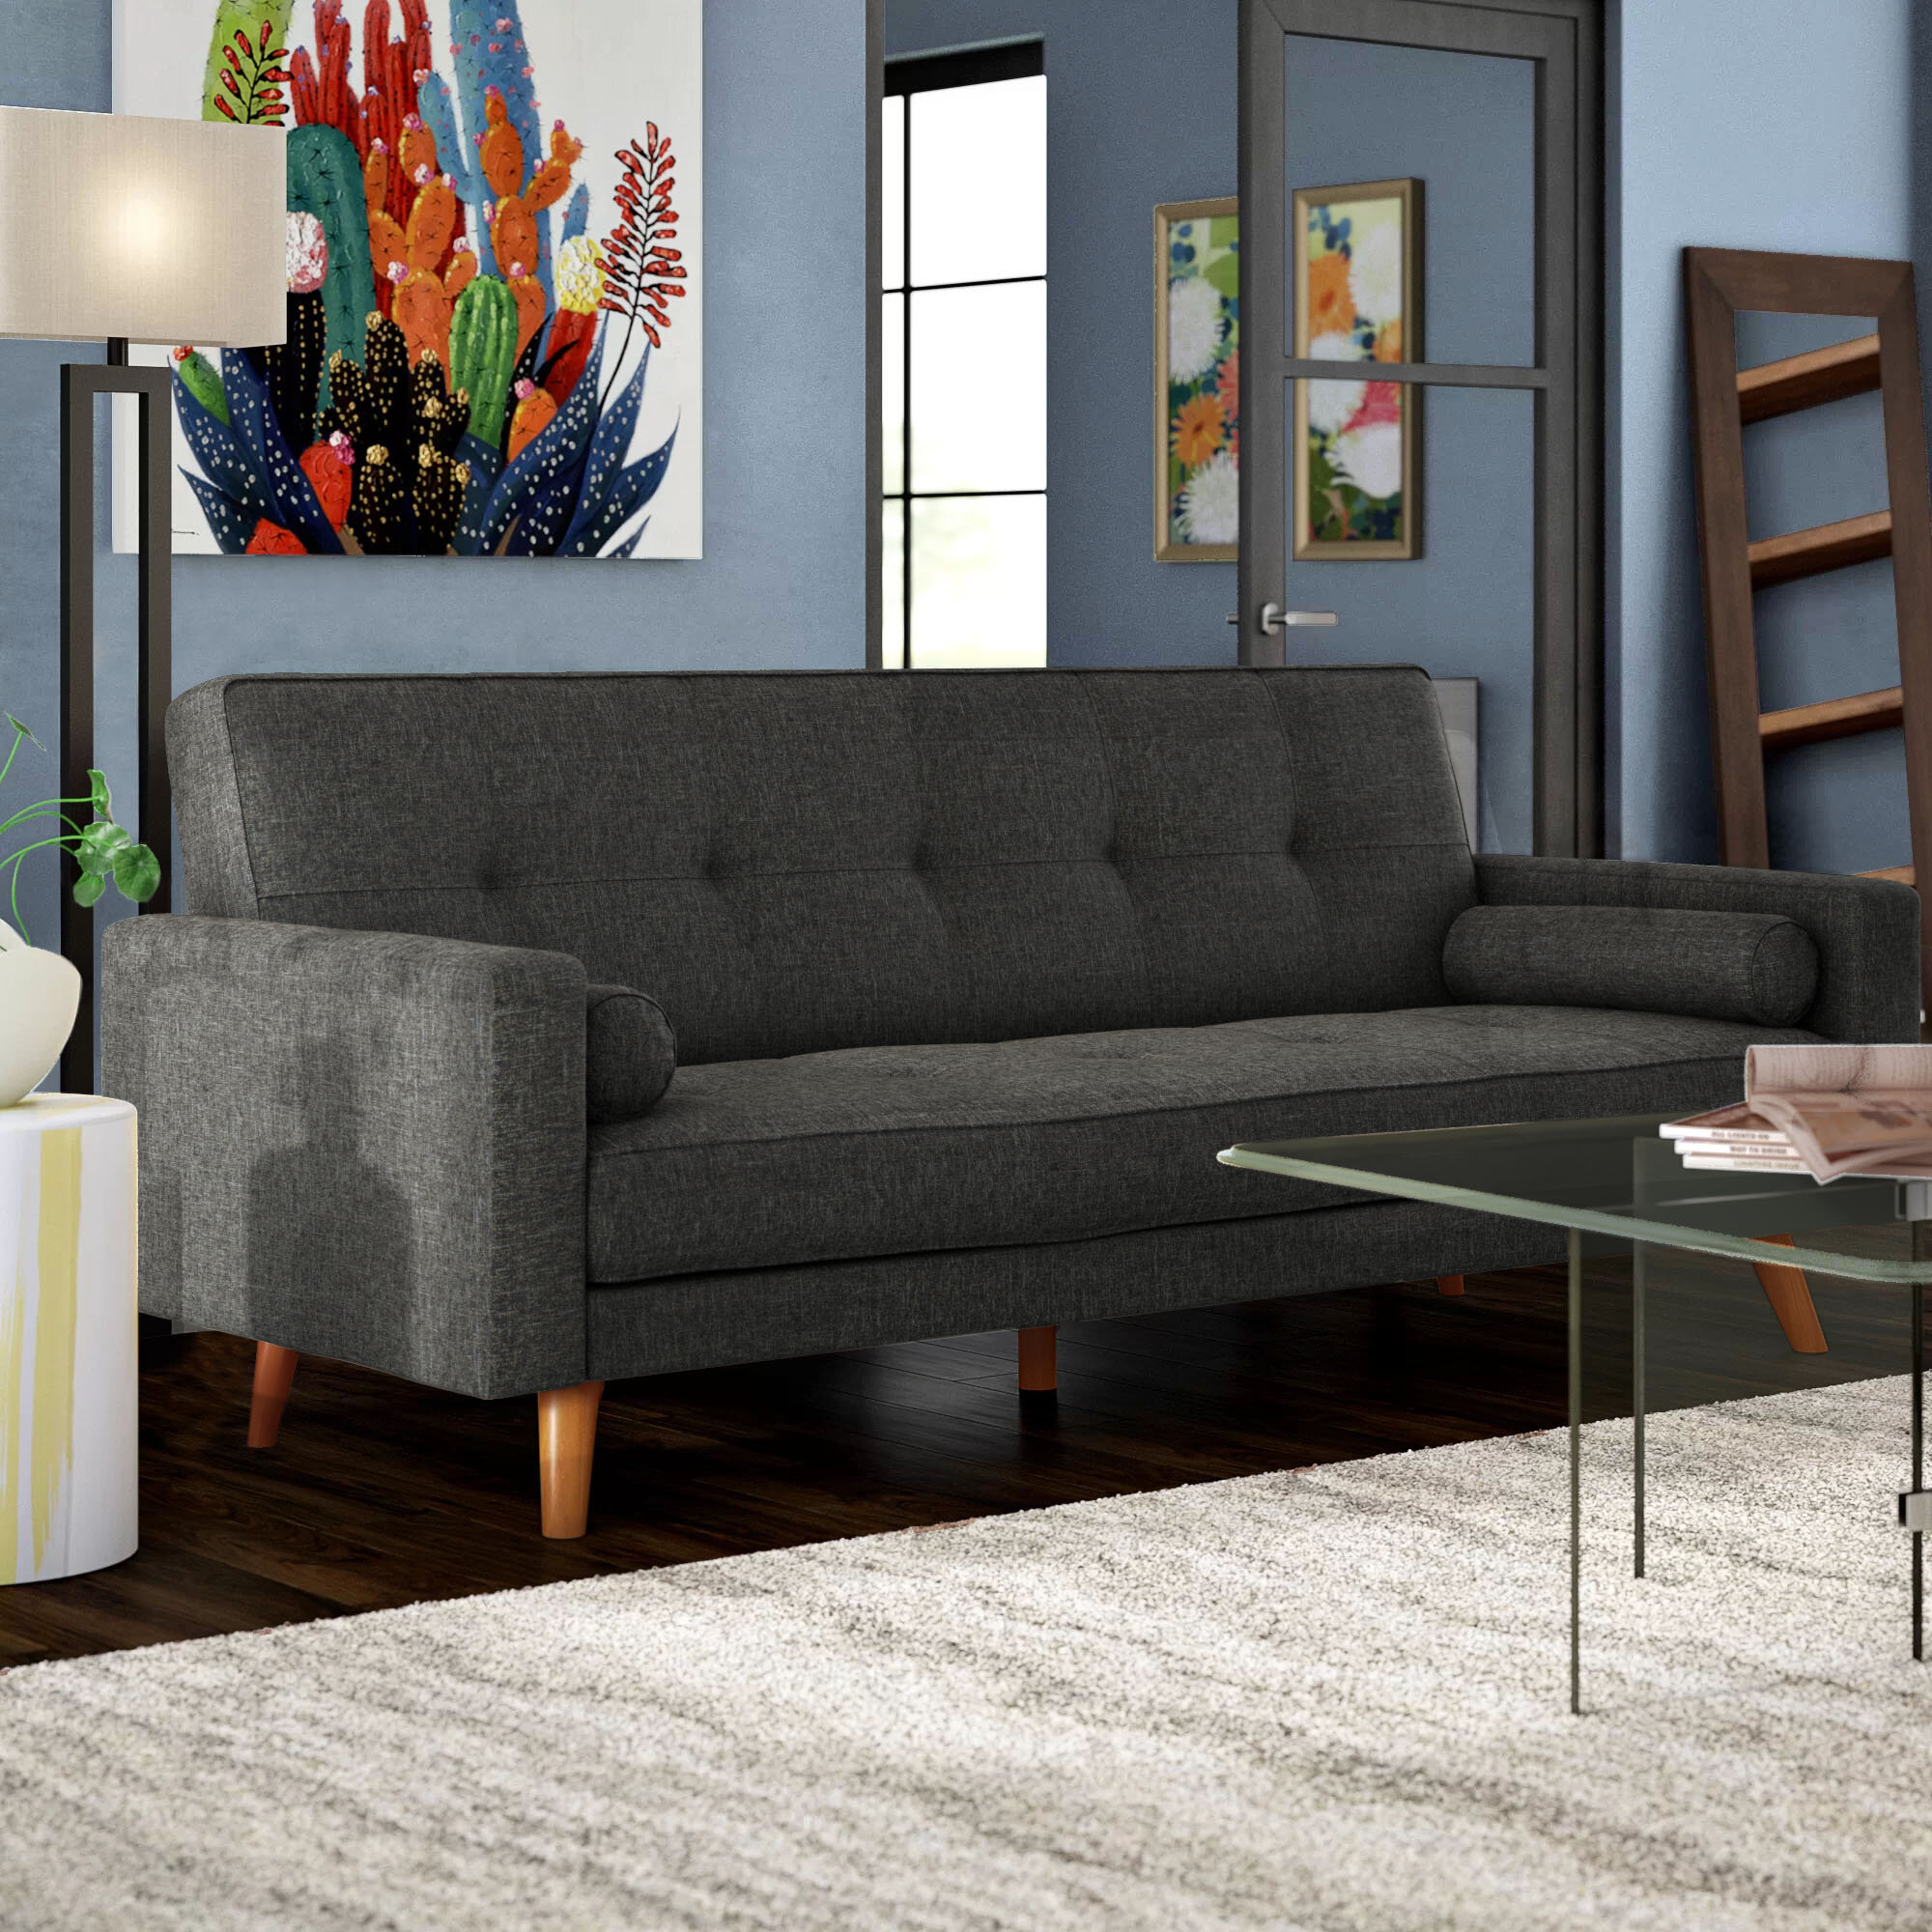 Langley Street Adrienne Sleeper Sofa U0026 Reviews | Wayfair